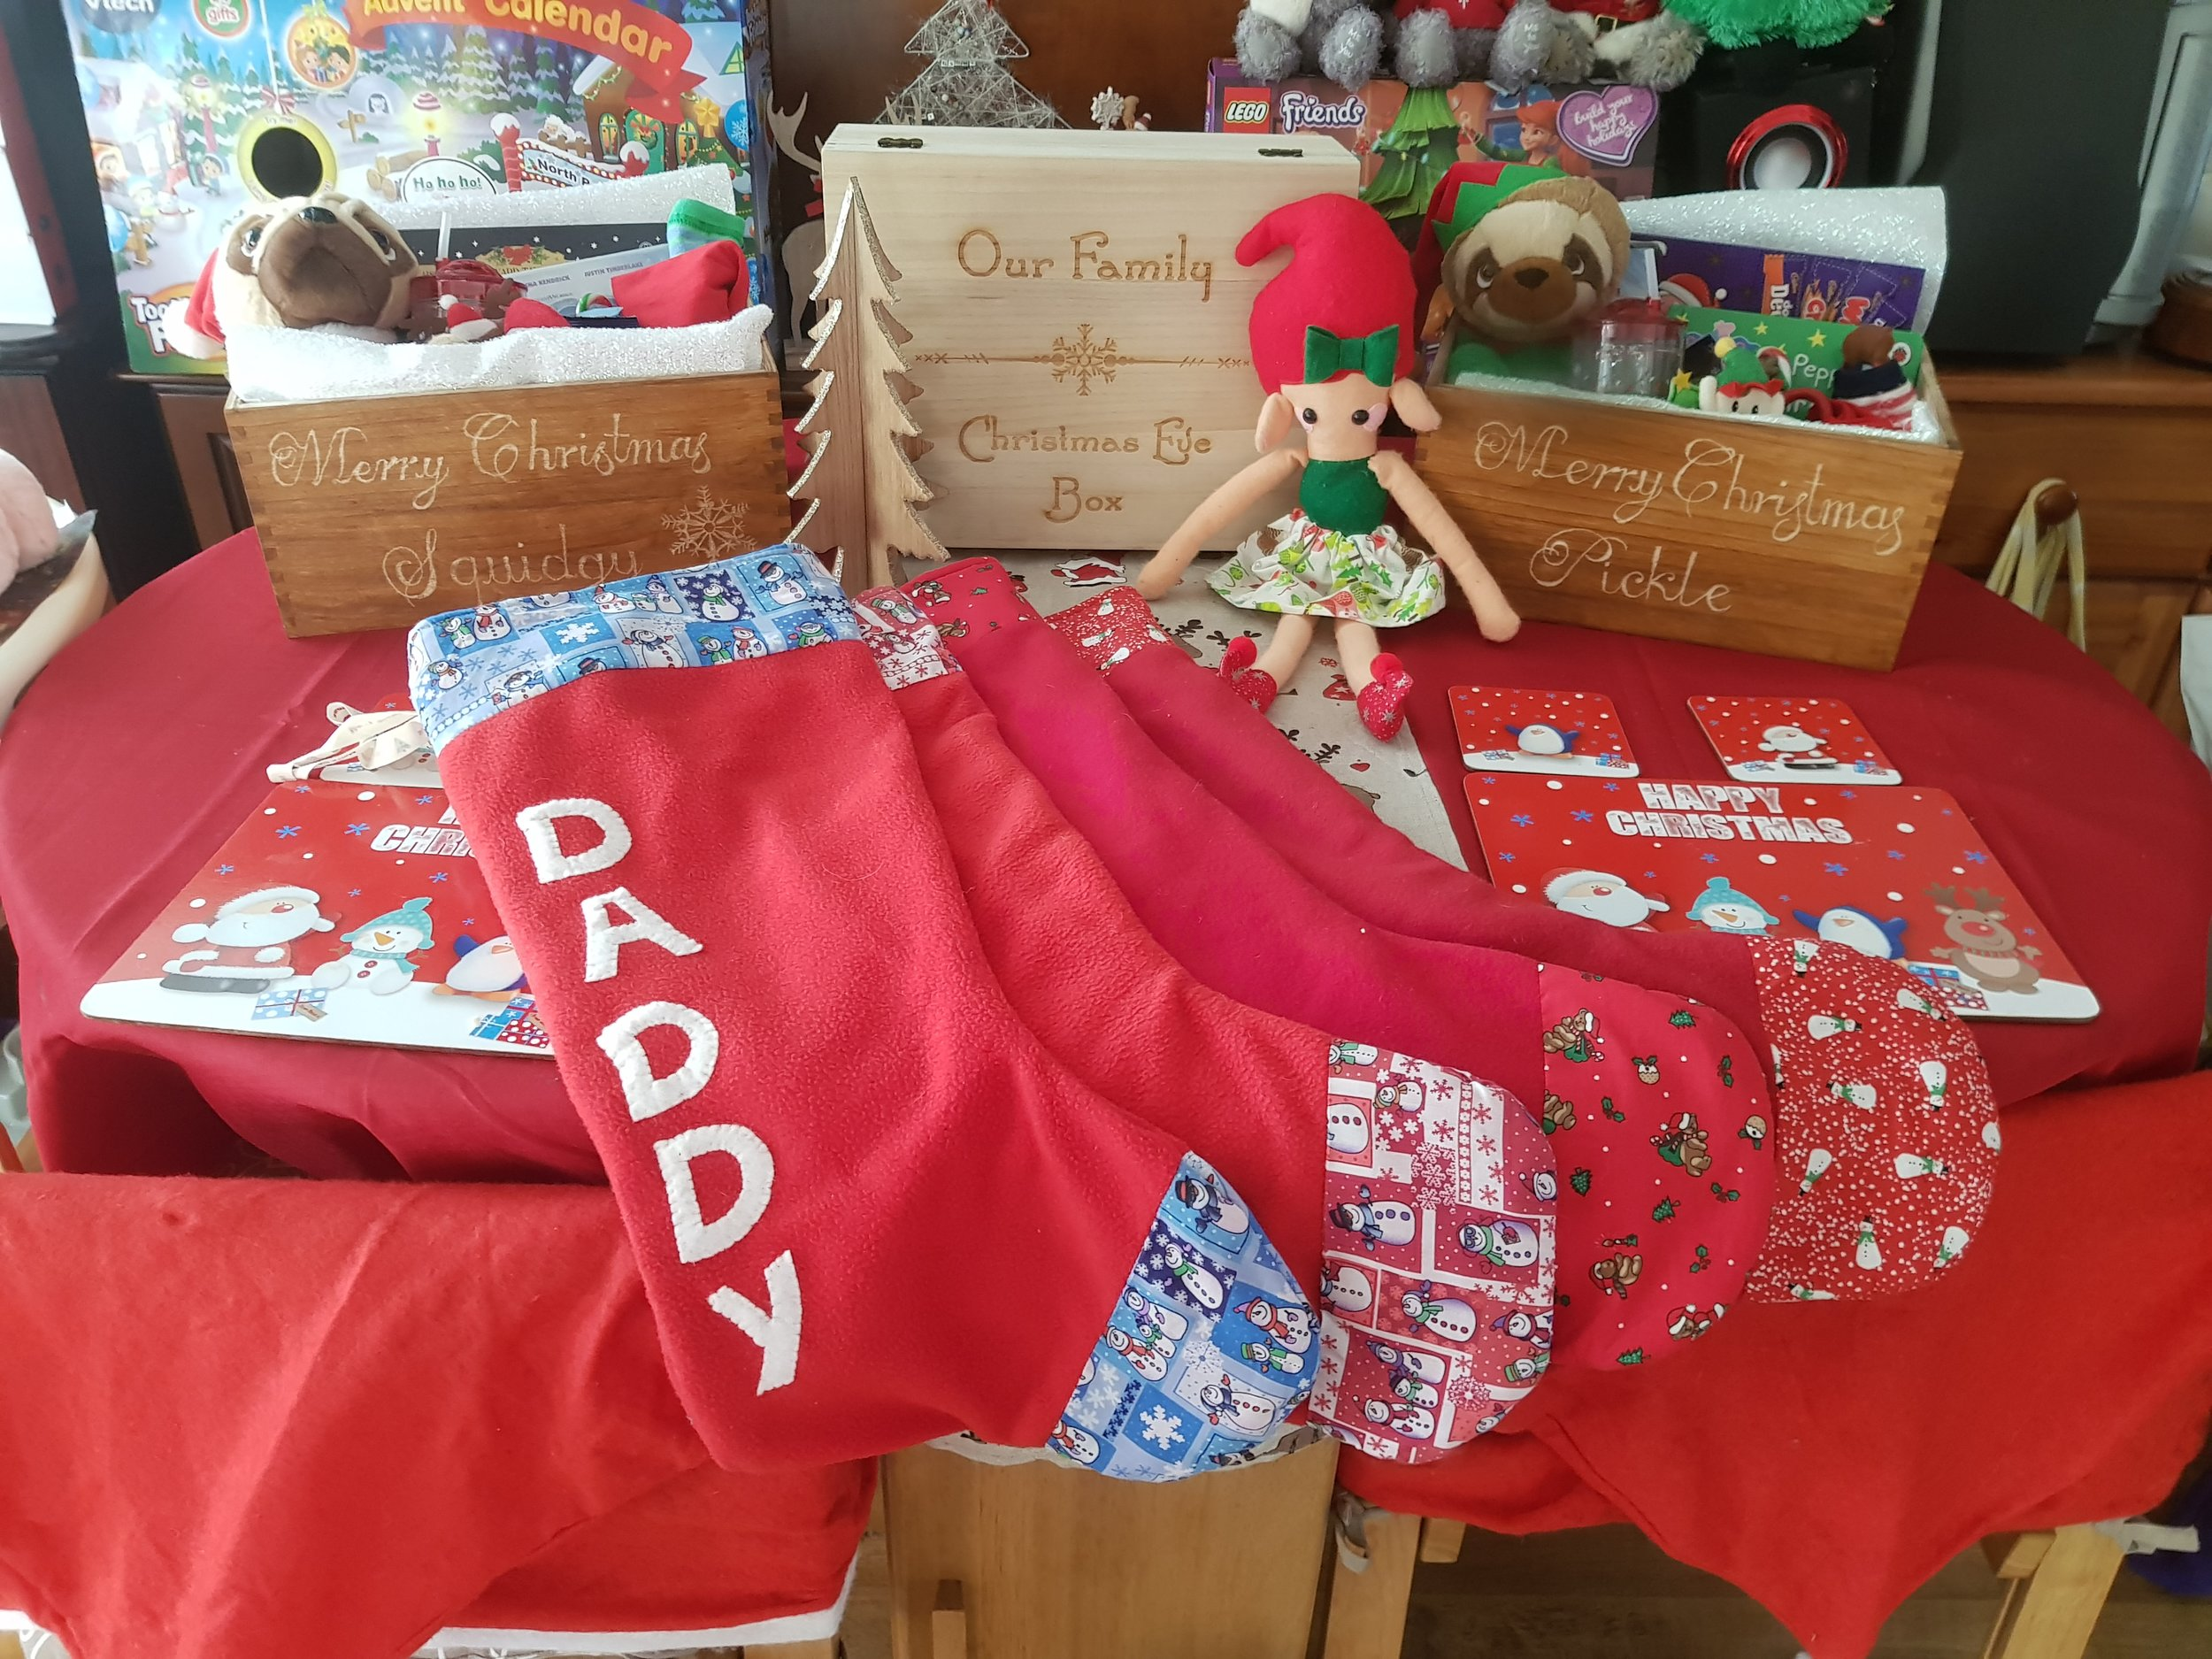 Elf on the Shelf Christmas Eve Box